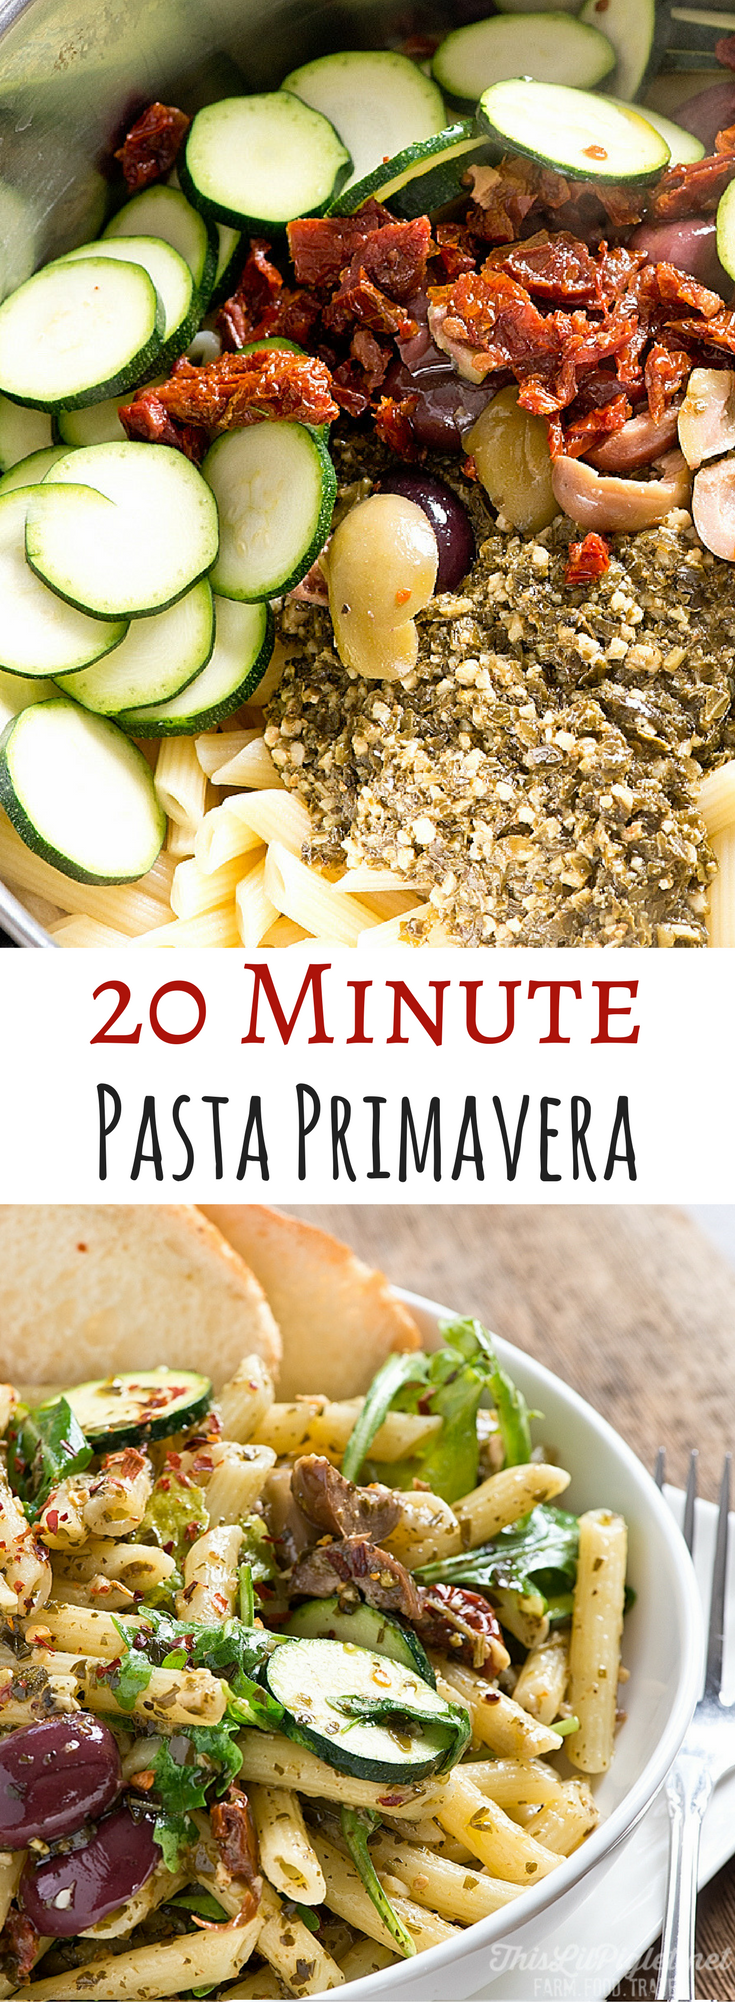 Easy 20 Minute Pasta Primavera // thislilpiglet.net